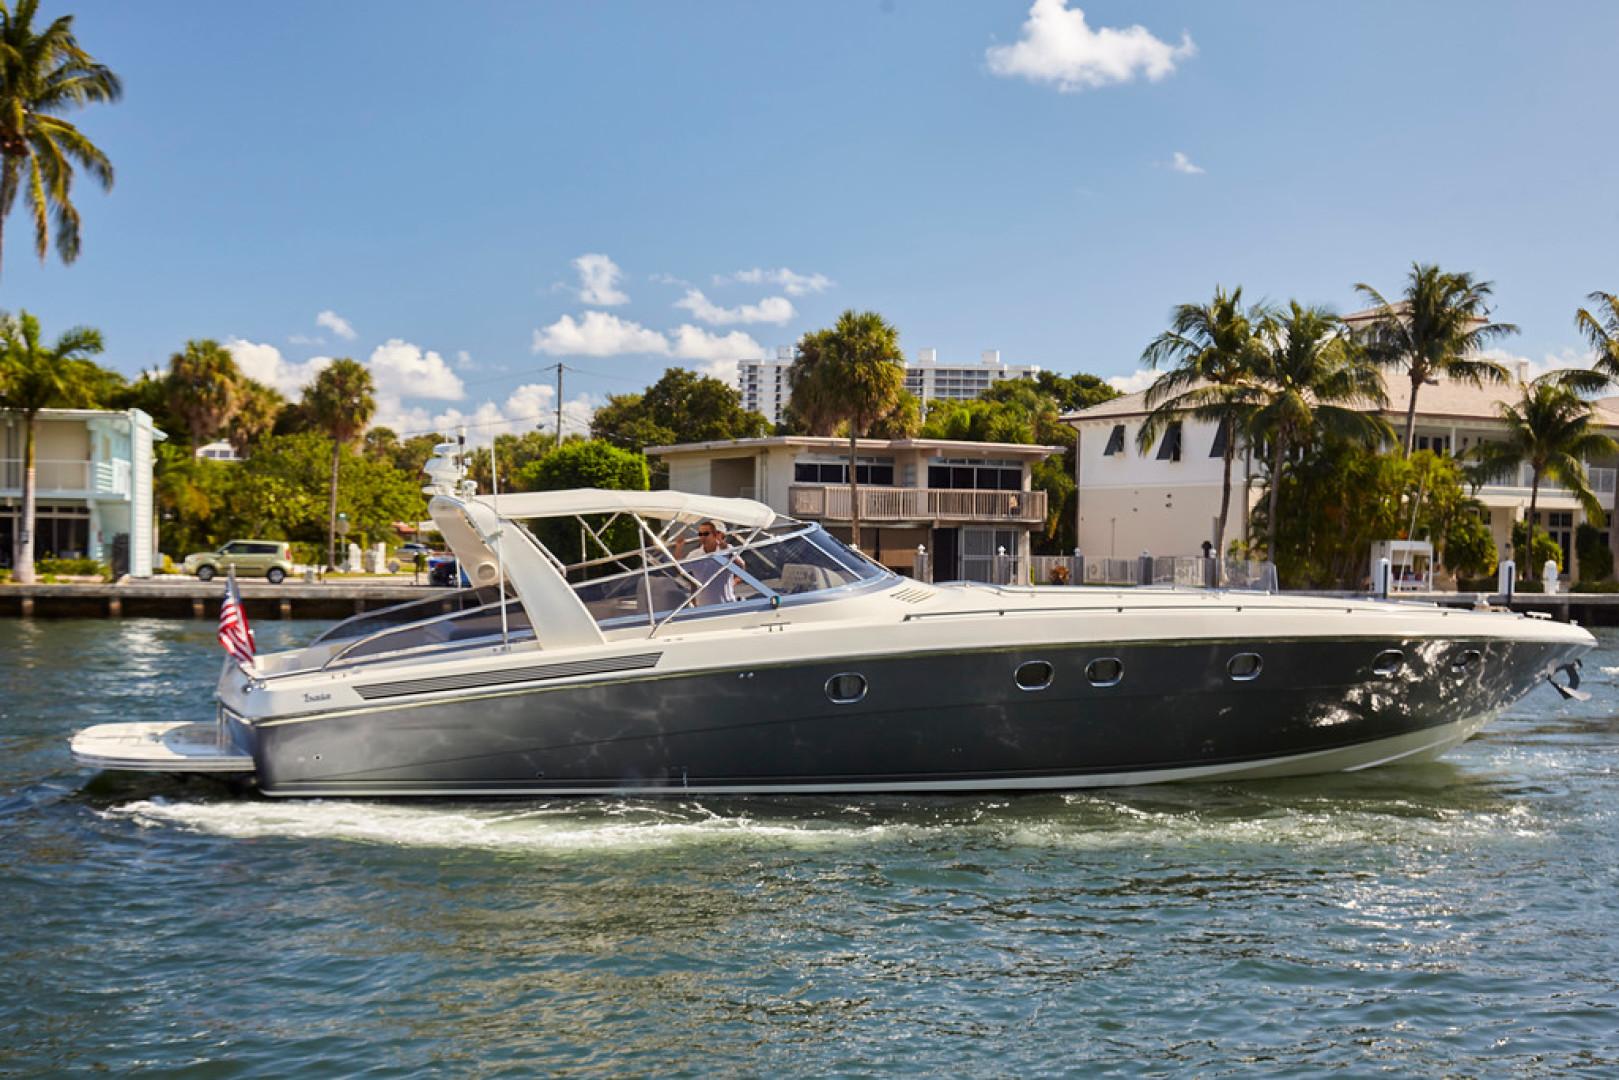 Baia-Sports Cruiser 1998 -Fort Lauderdale-Florida-United States-1275575 | Thumbnail